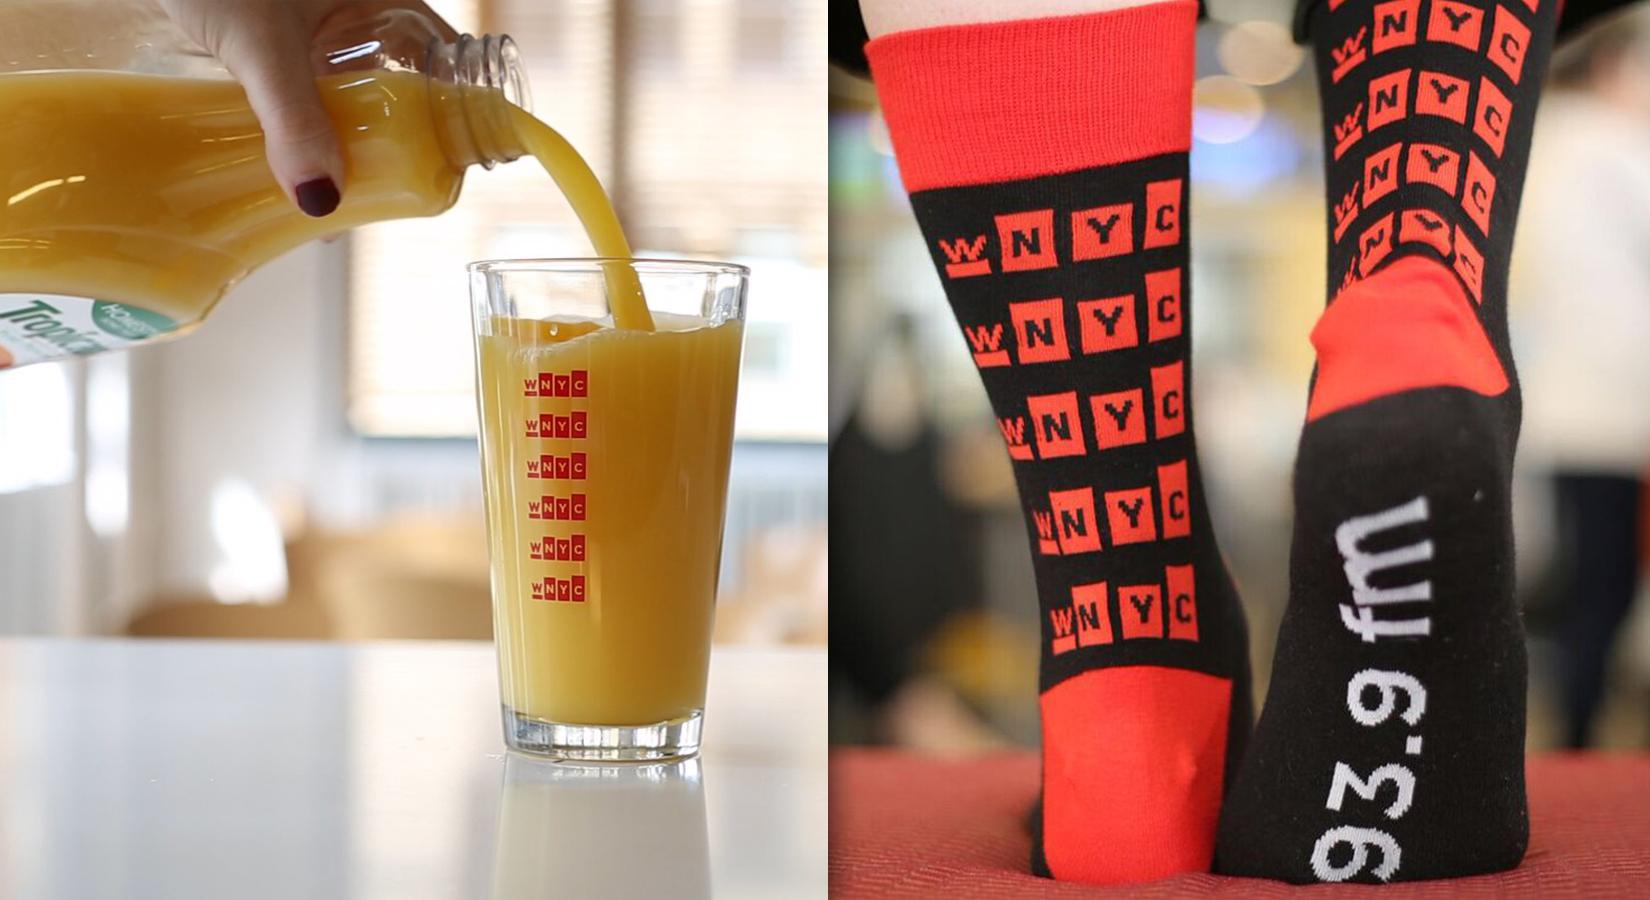 "#CreatedByCaptiv8: WNYC Branded ""Thank You"" Gifts"